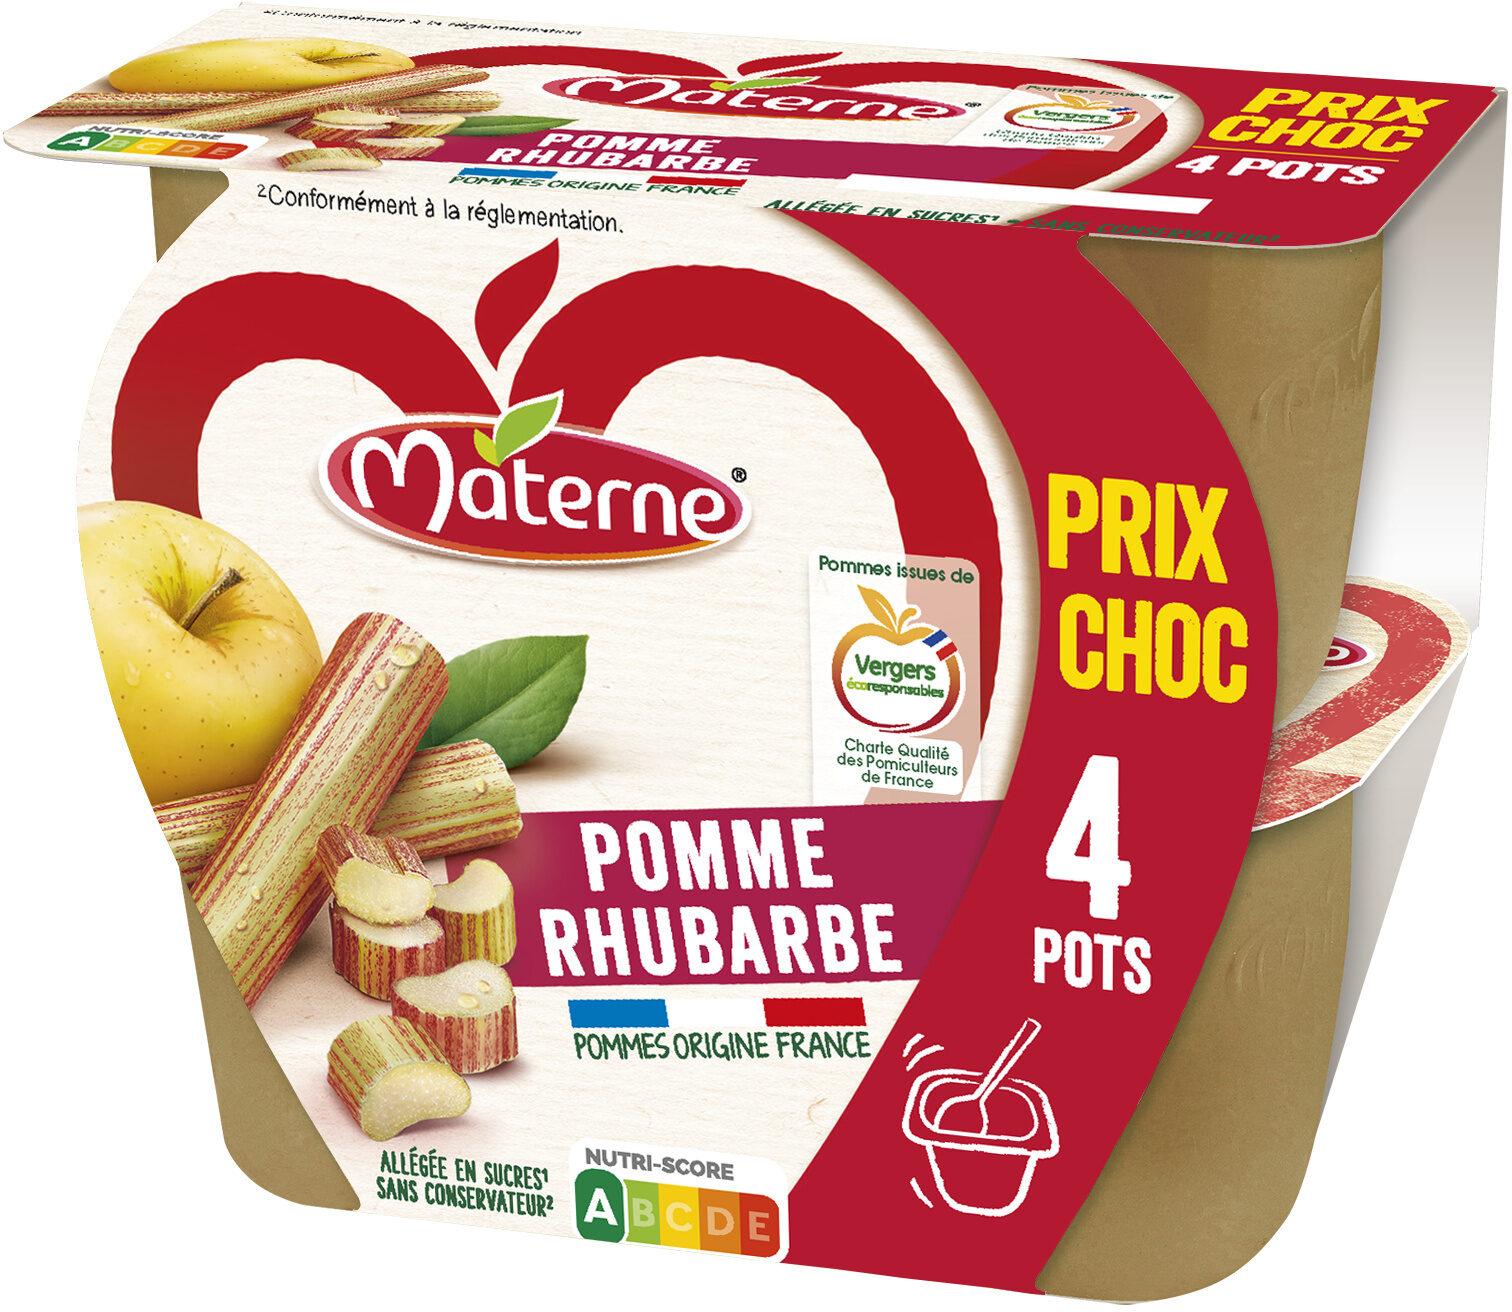 MATERNE Pomme Rhubarbe 4x100g Prix Choc - Produit - fr